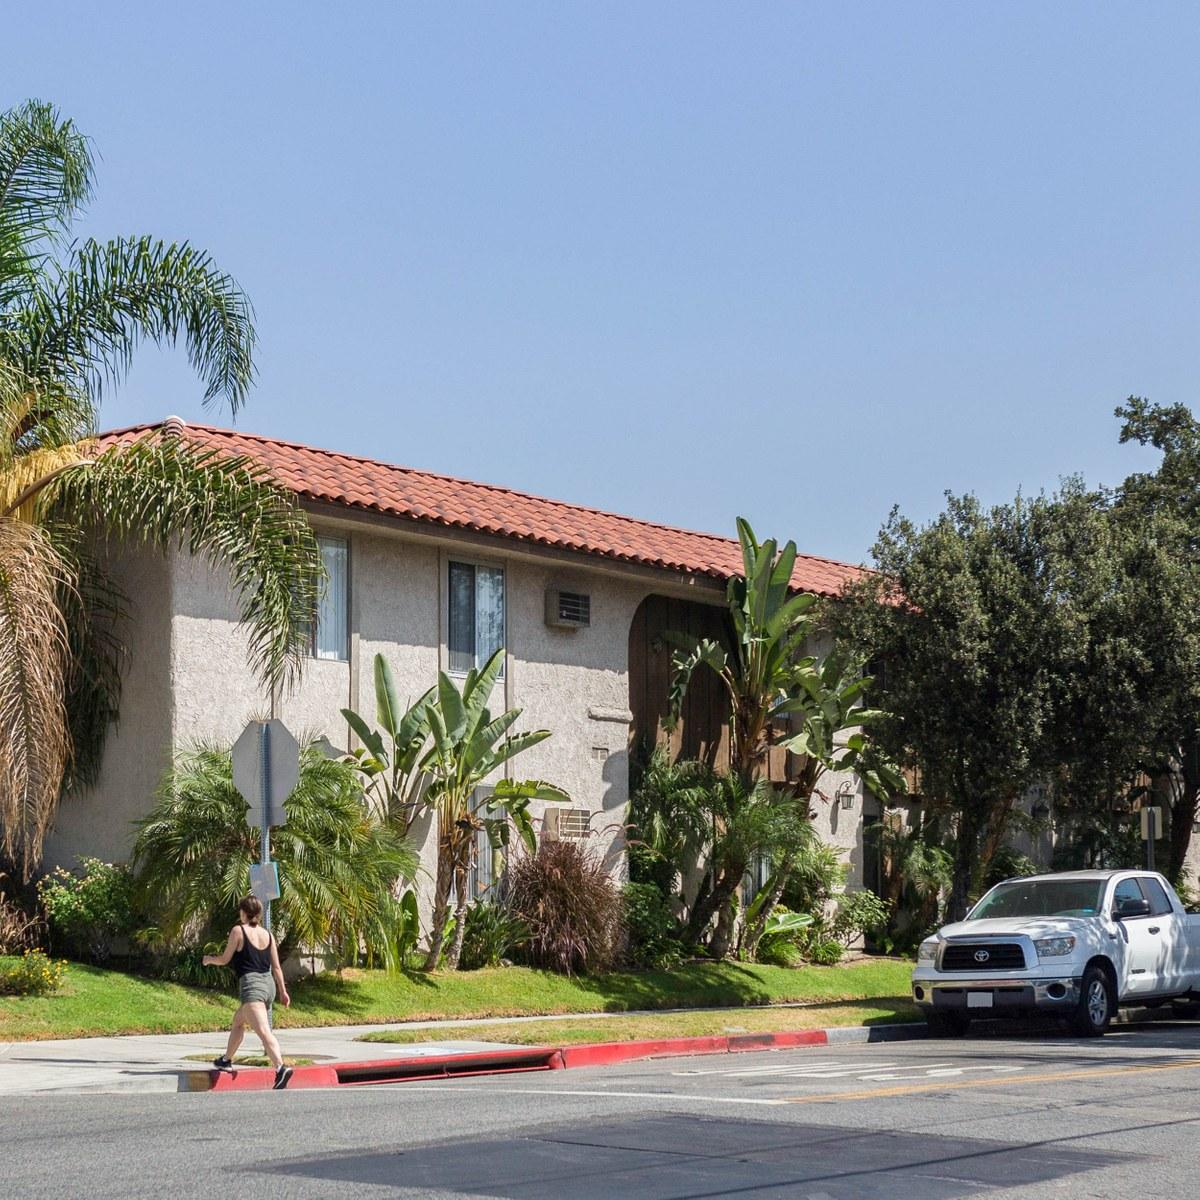 Citrus Grove Apartments: Citrus Grove, Glendale CA - Neighborhood Guide